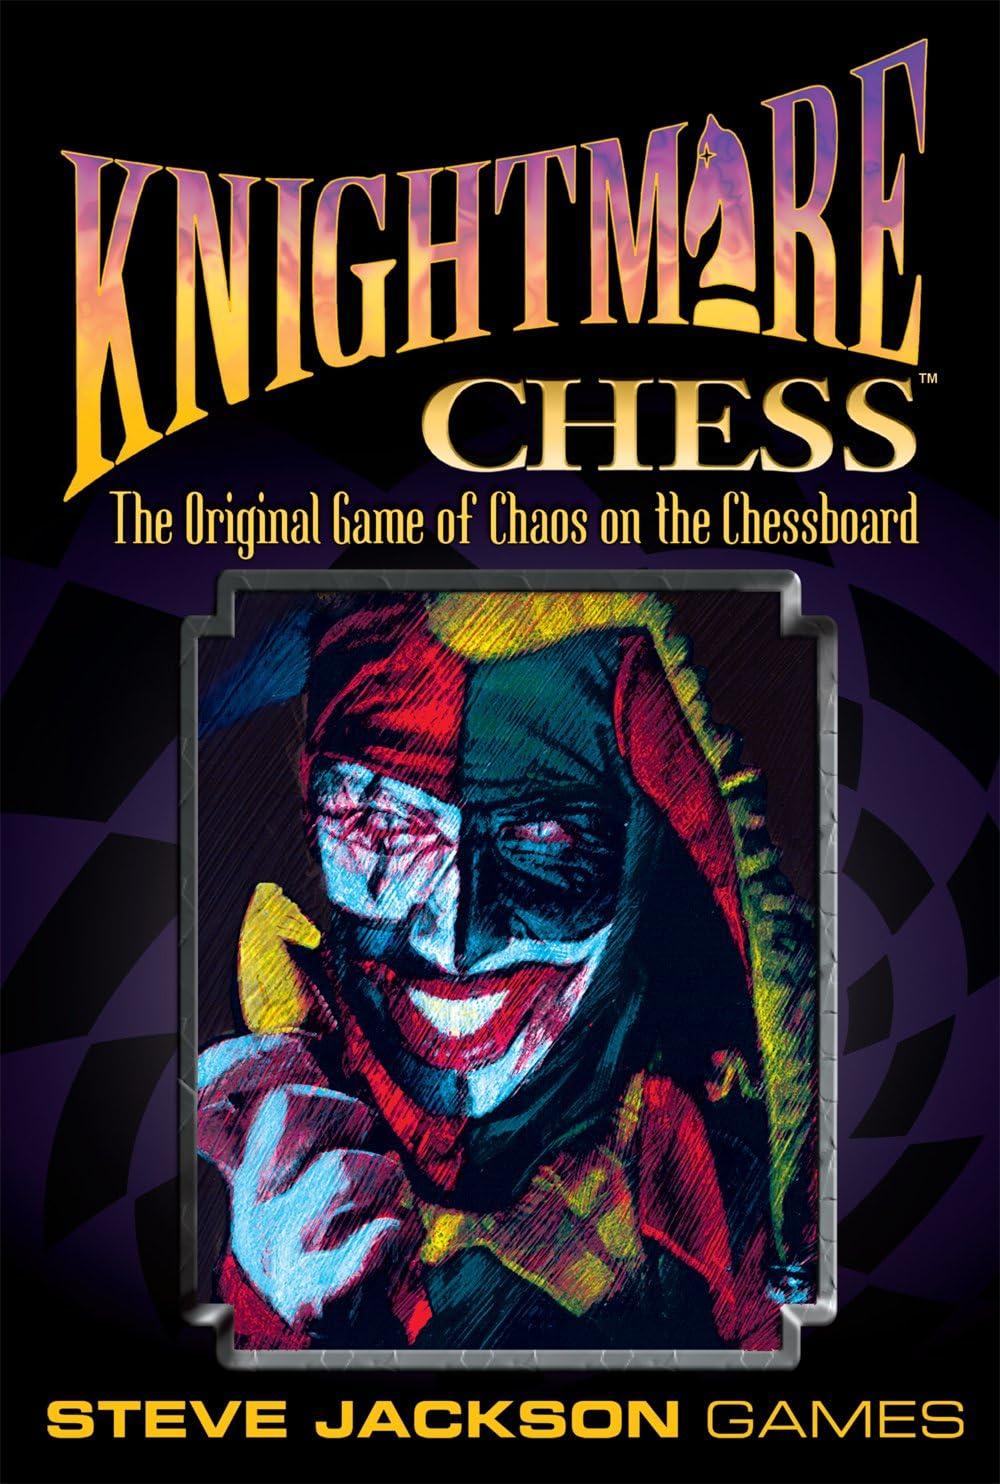 Steve Jackson Games Knightmare Edition Third 限定品 無料 - Chess